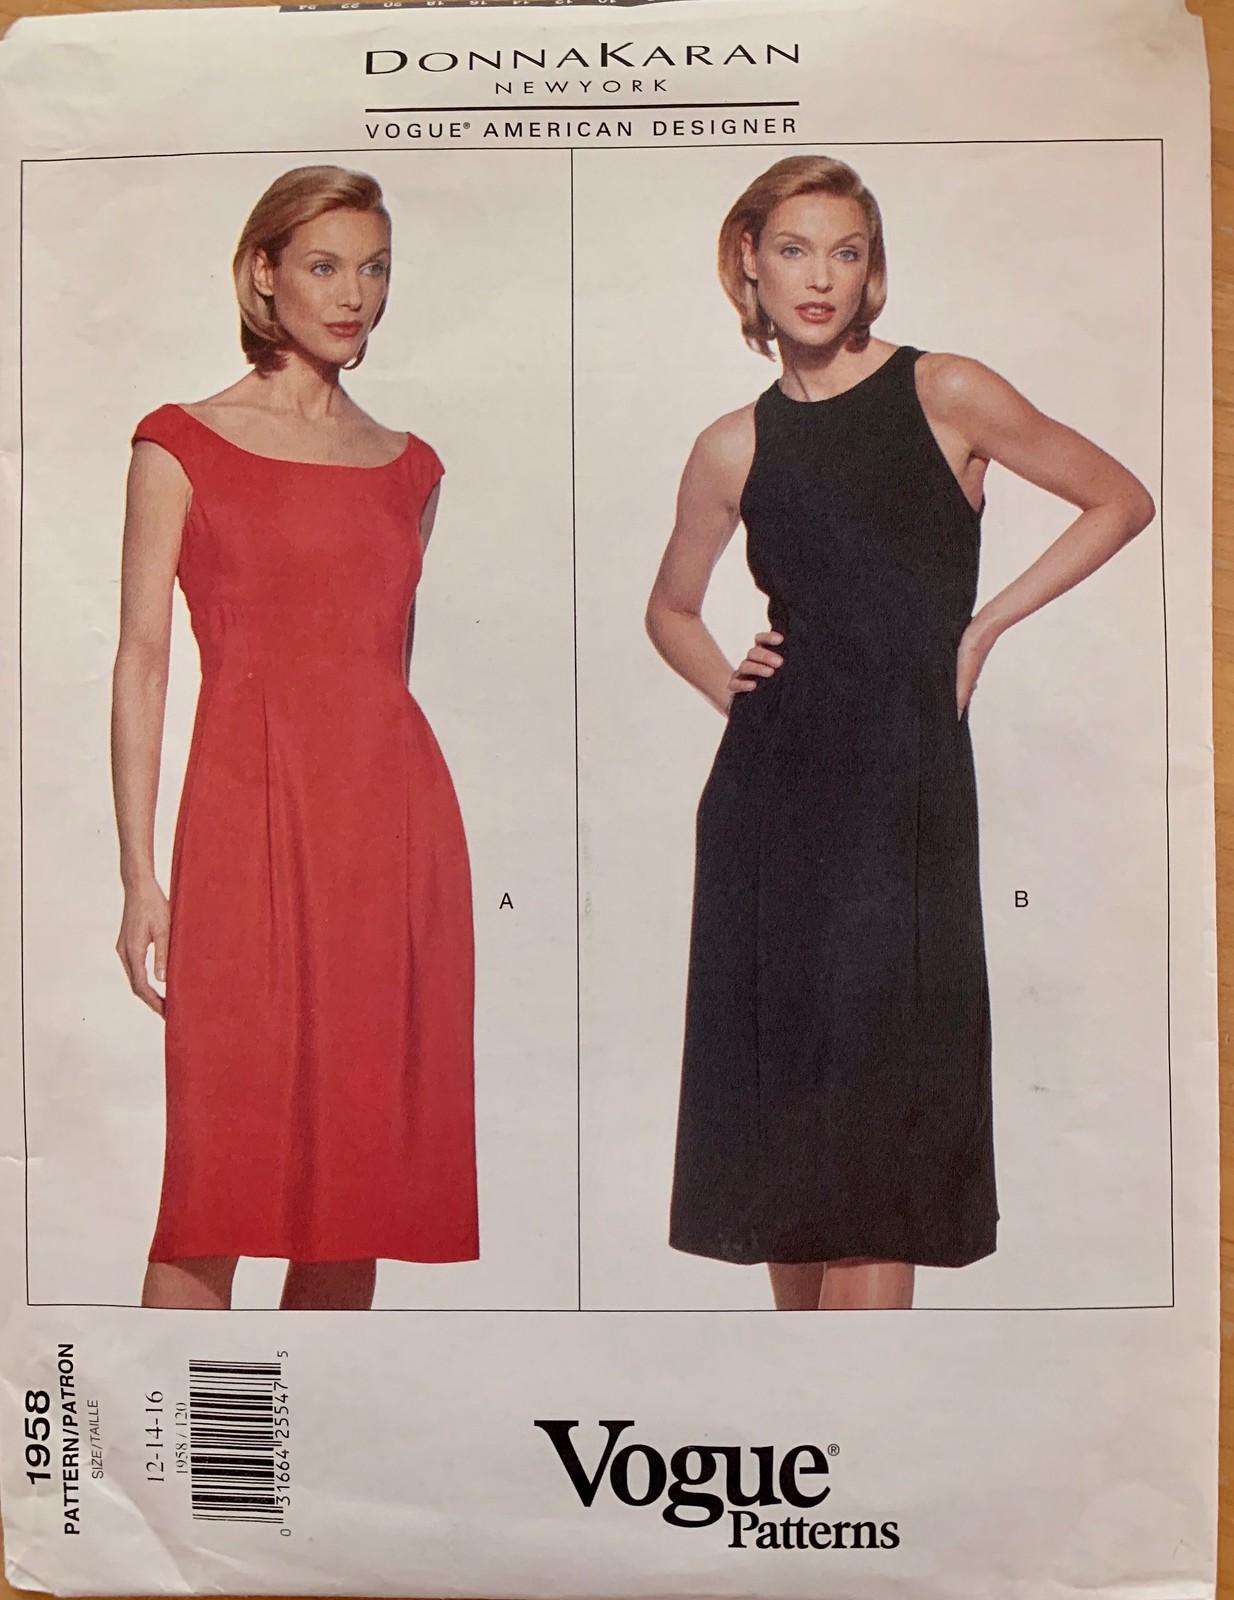 Vogue 1958 DKNY pattern red dress